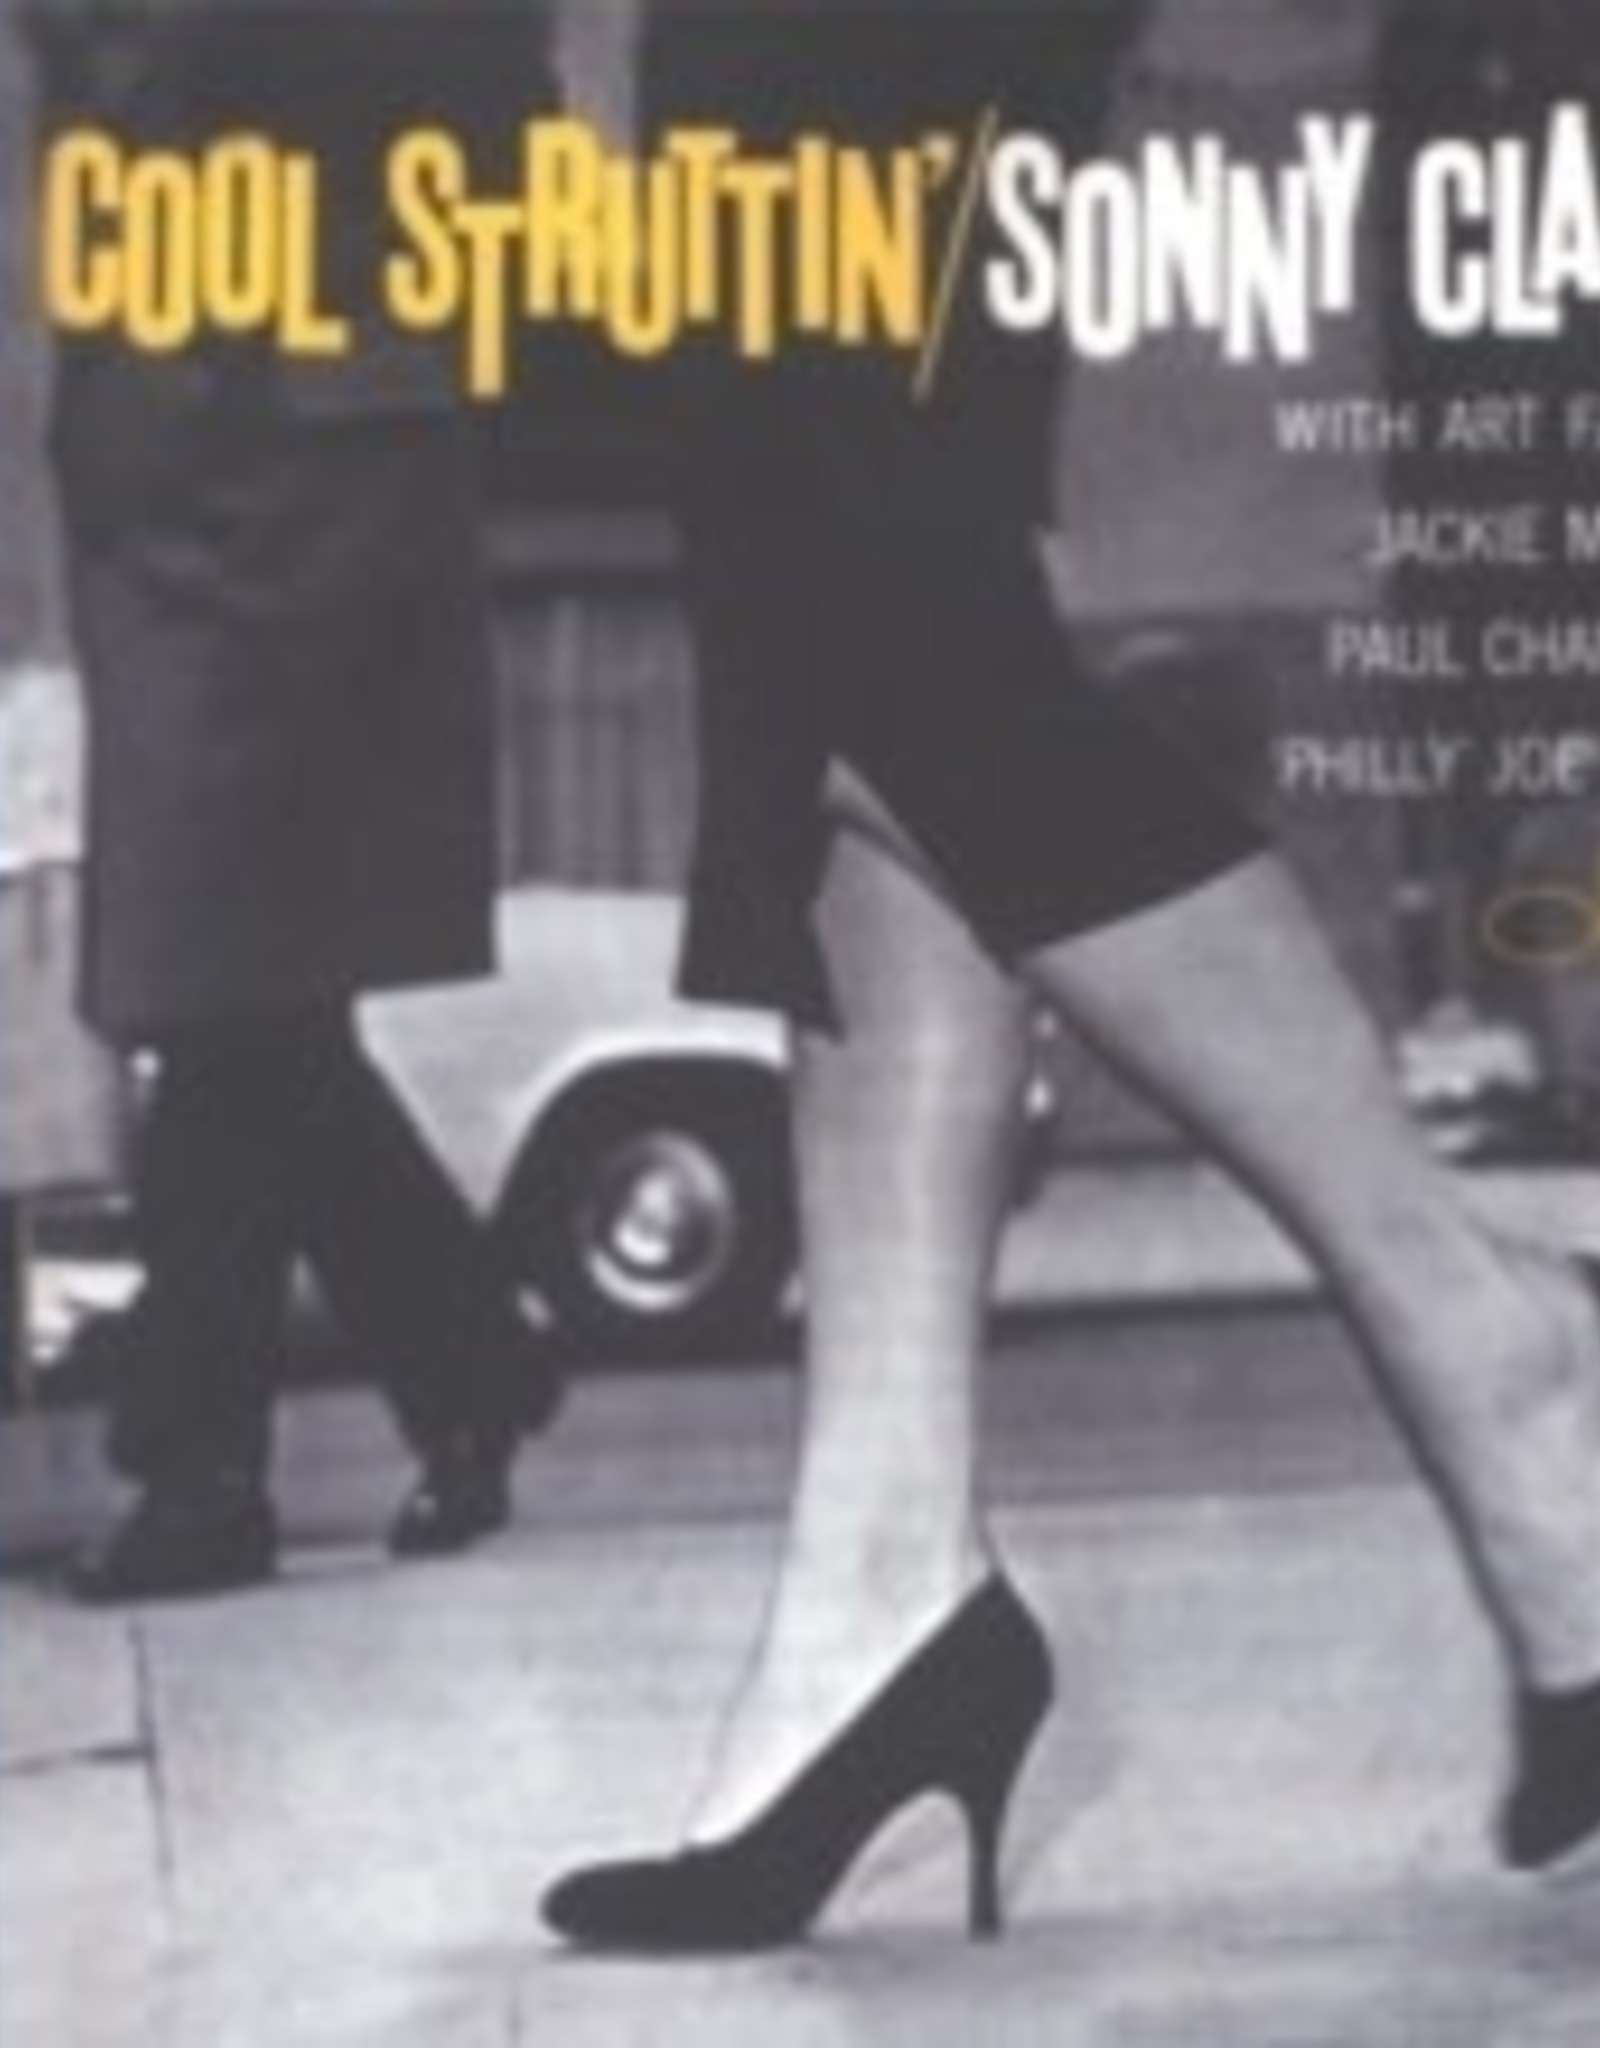 Sonny Clark - Cool Struttin' (Blue Note Classic Vinyl Edition)(Analogue Remaster)